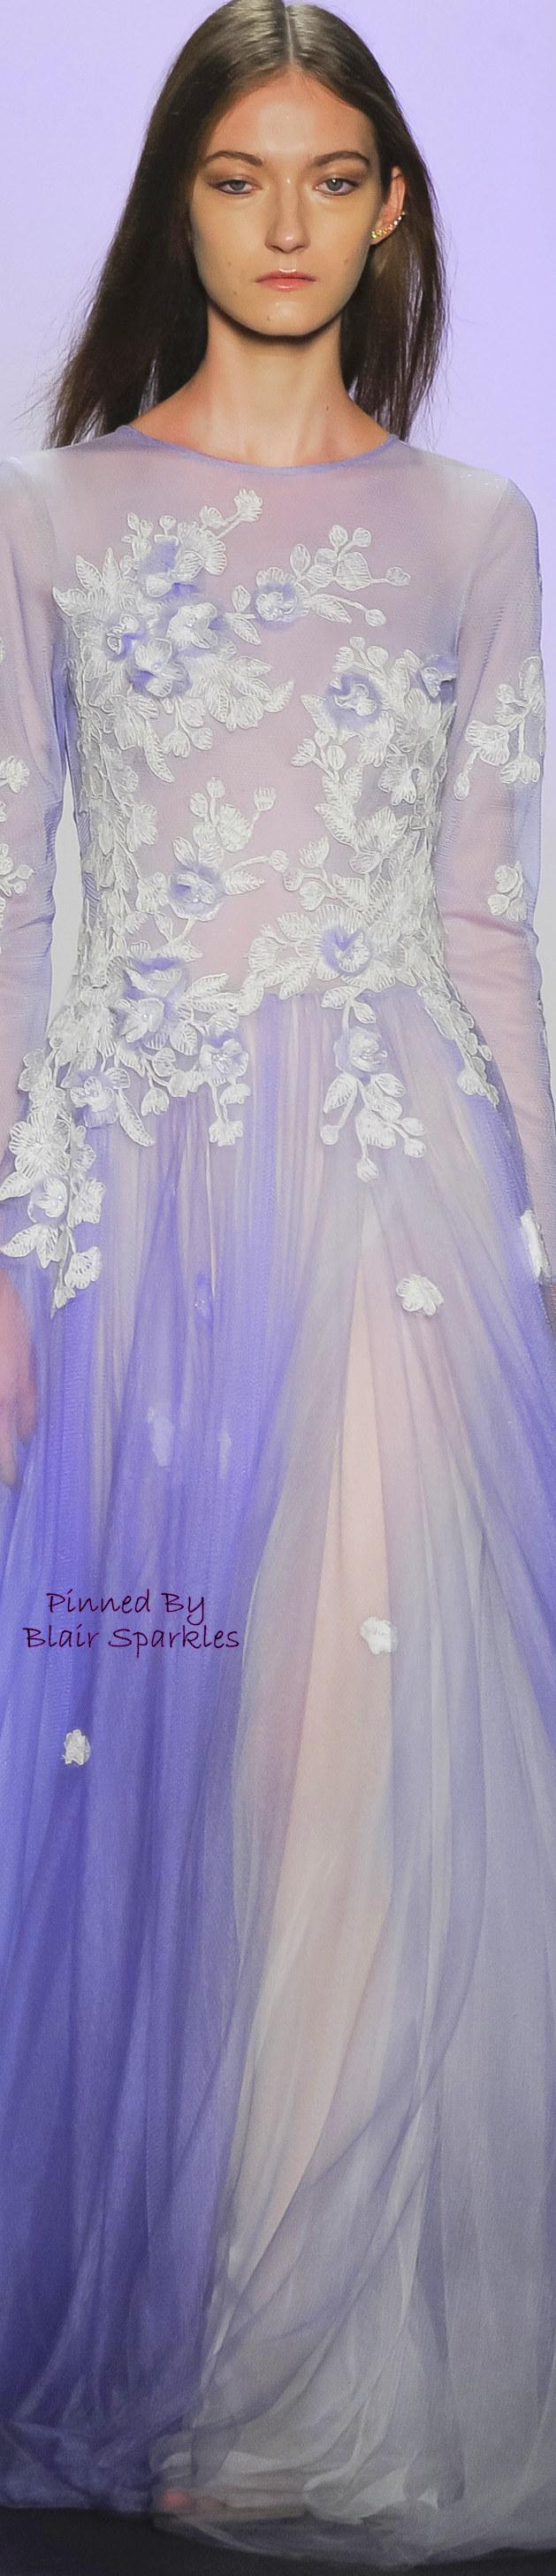 Lujo Vestido De Novia Tadashi Patrón - Vestido de Novia Para Las ...